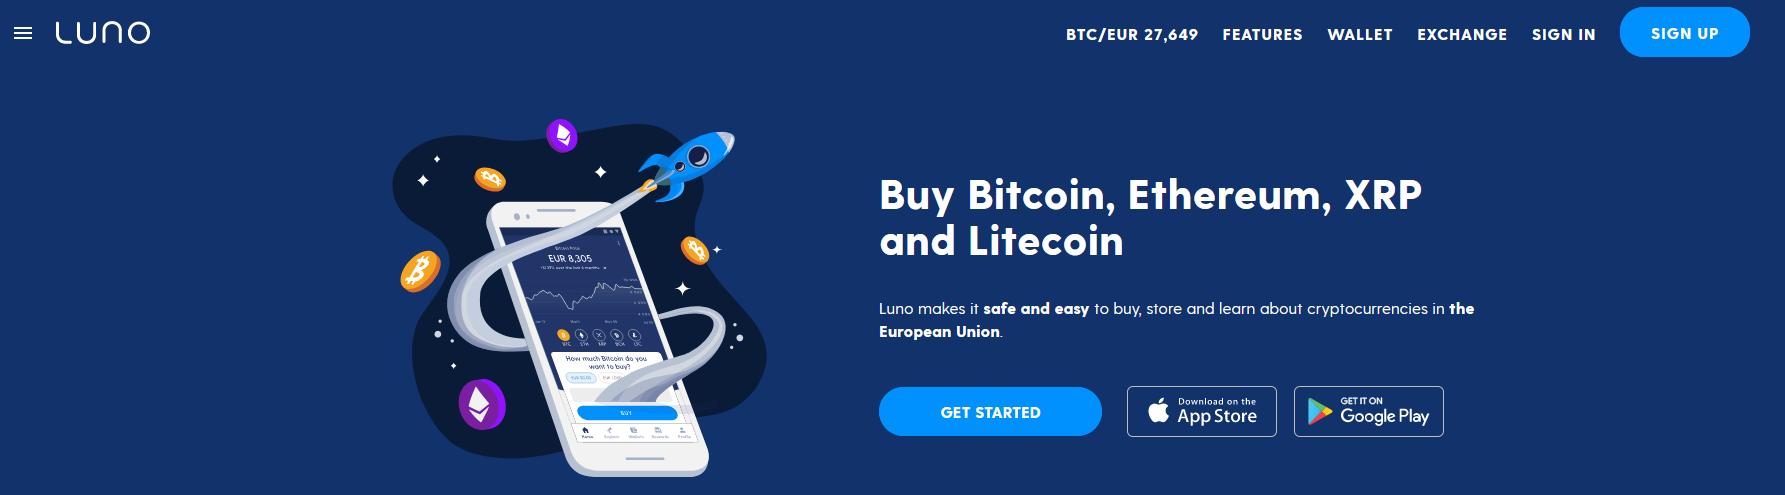 Luno-Review (1)